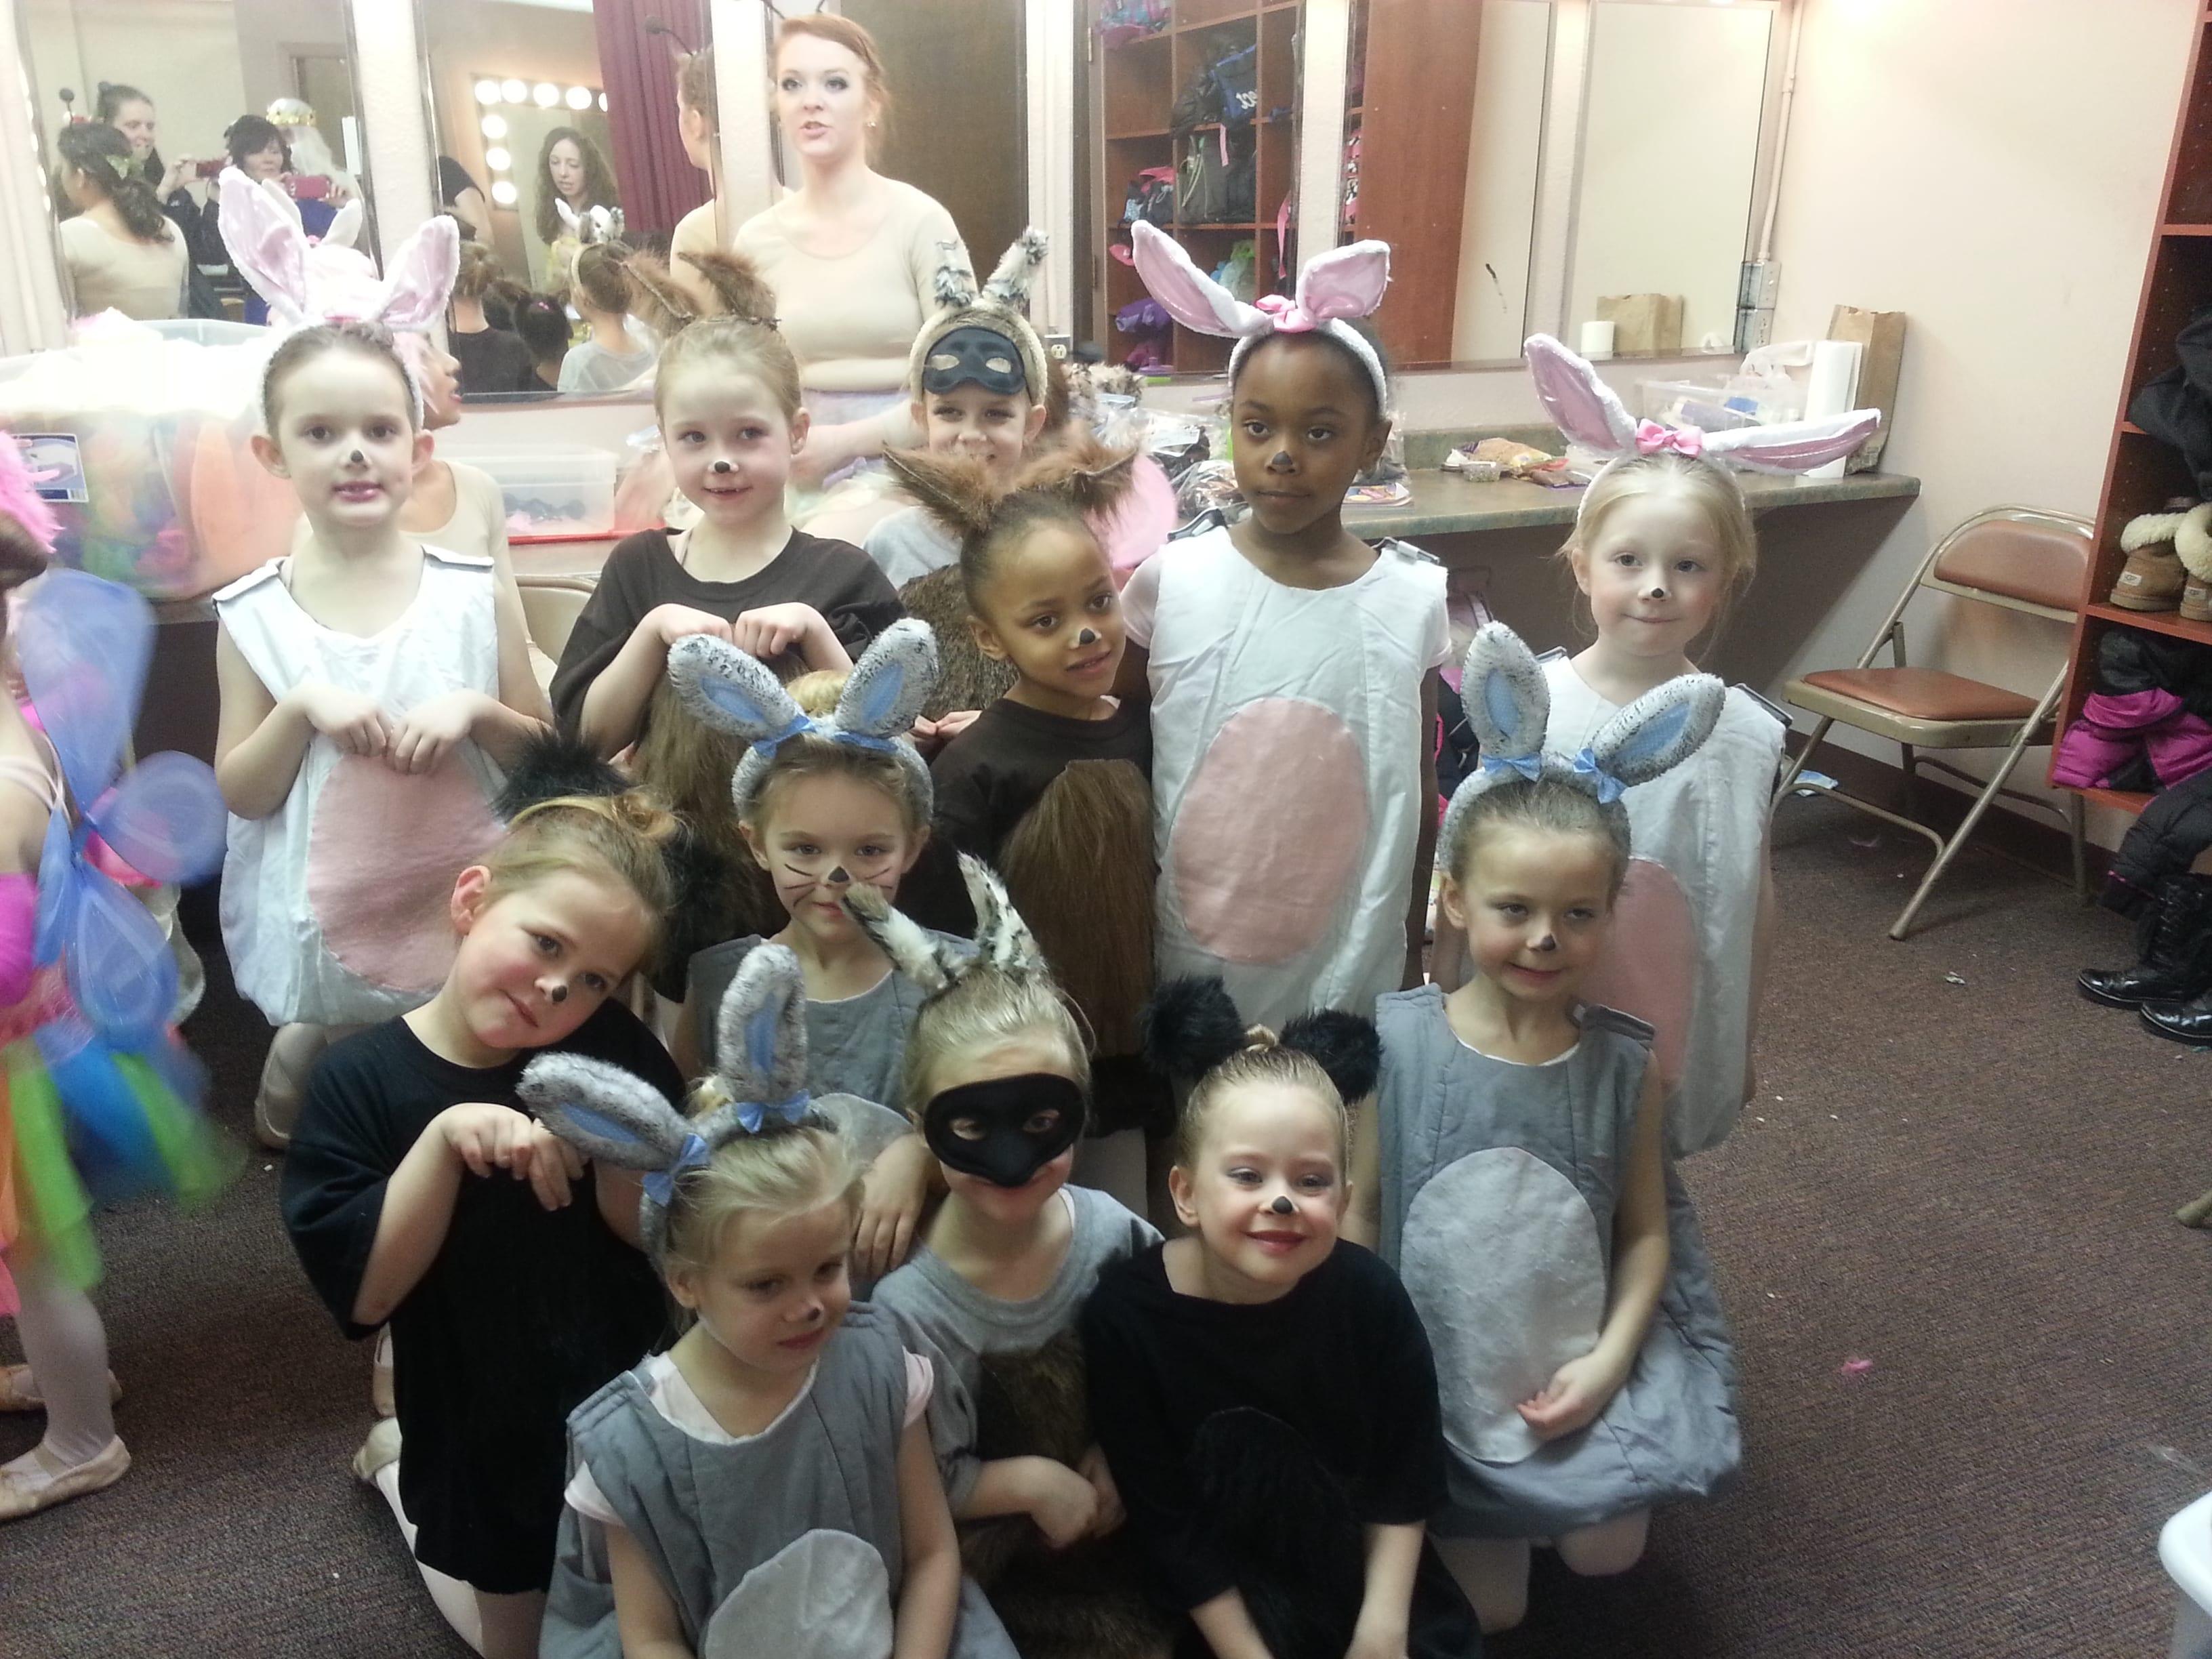 20130316_192219 – Beth Fowler School of Dance : Genoa and St. Charles Illinois